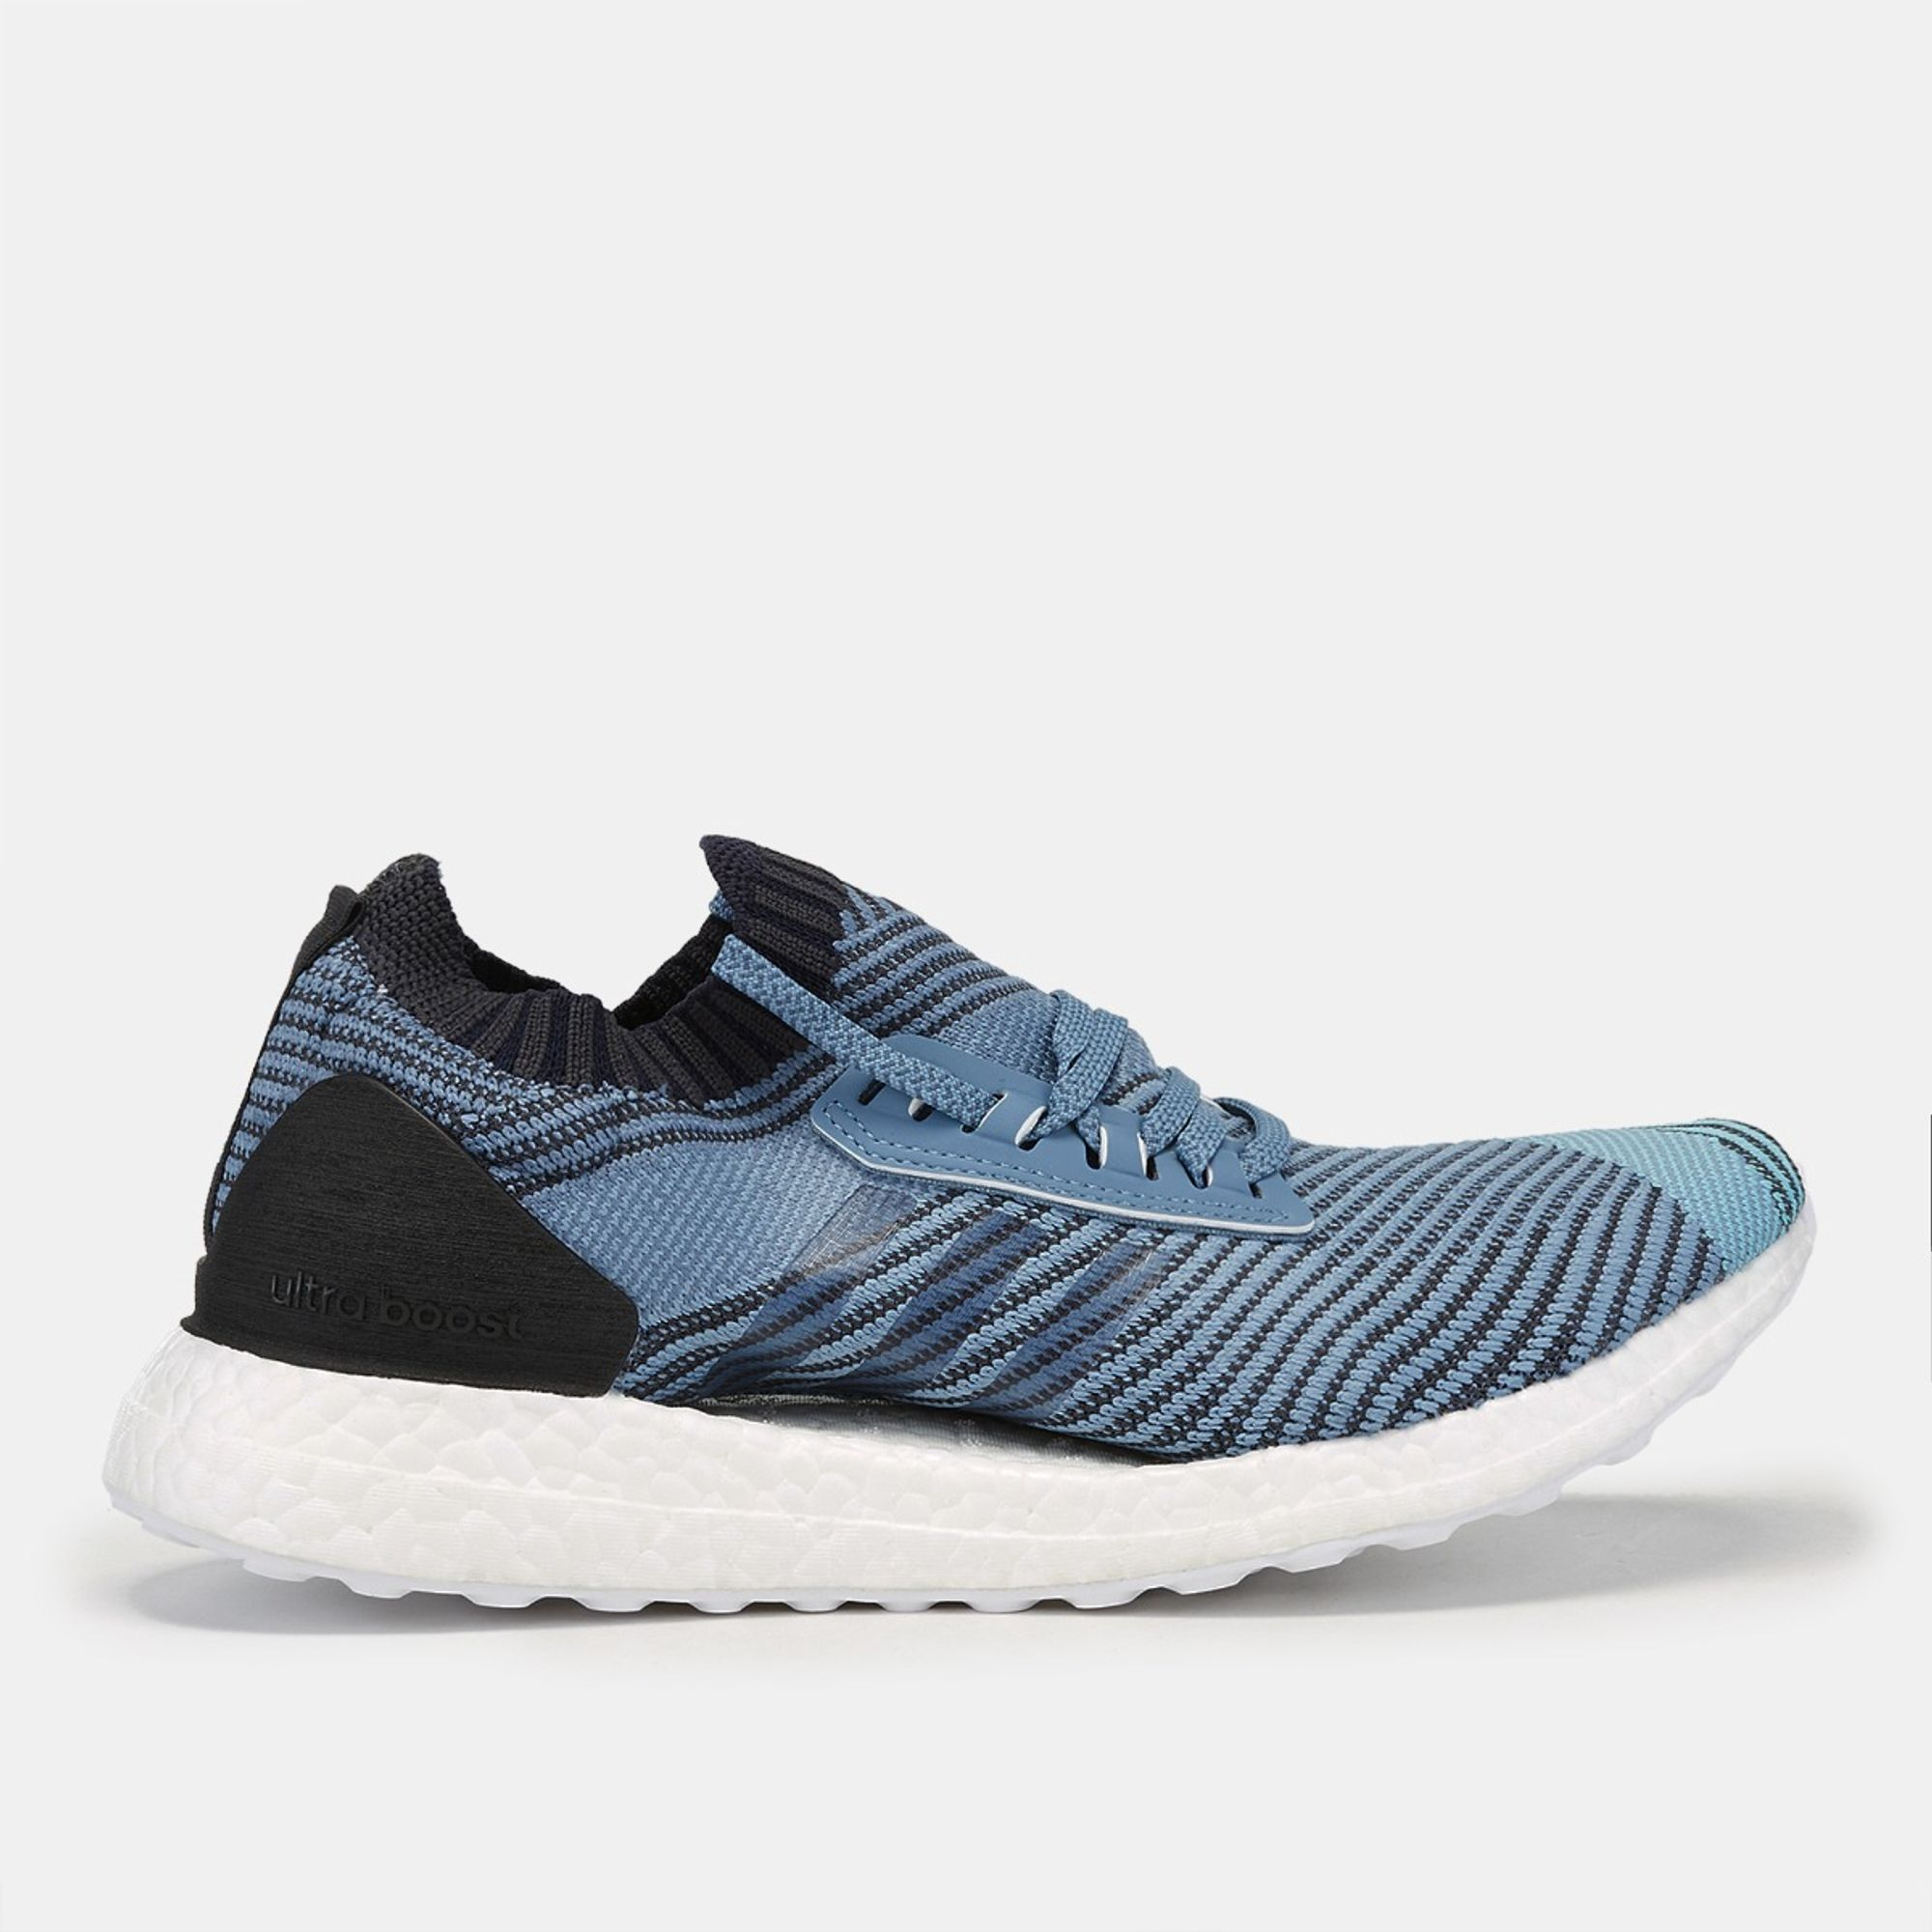 430e3018eb1af9 adidas Ultraboost Parley Shoe